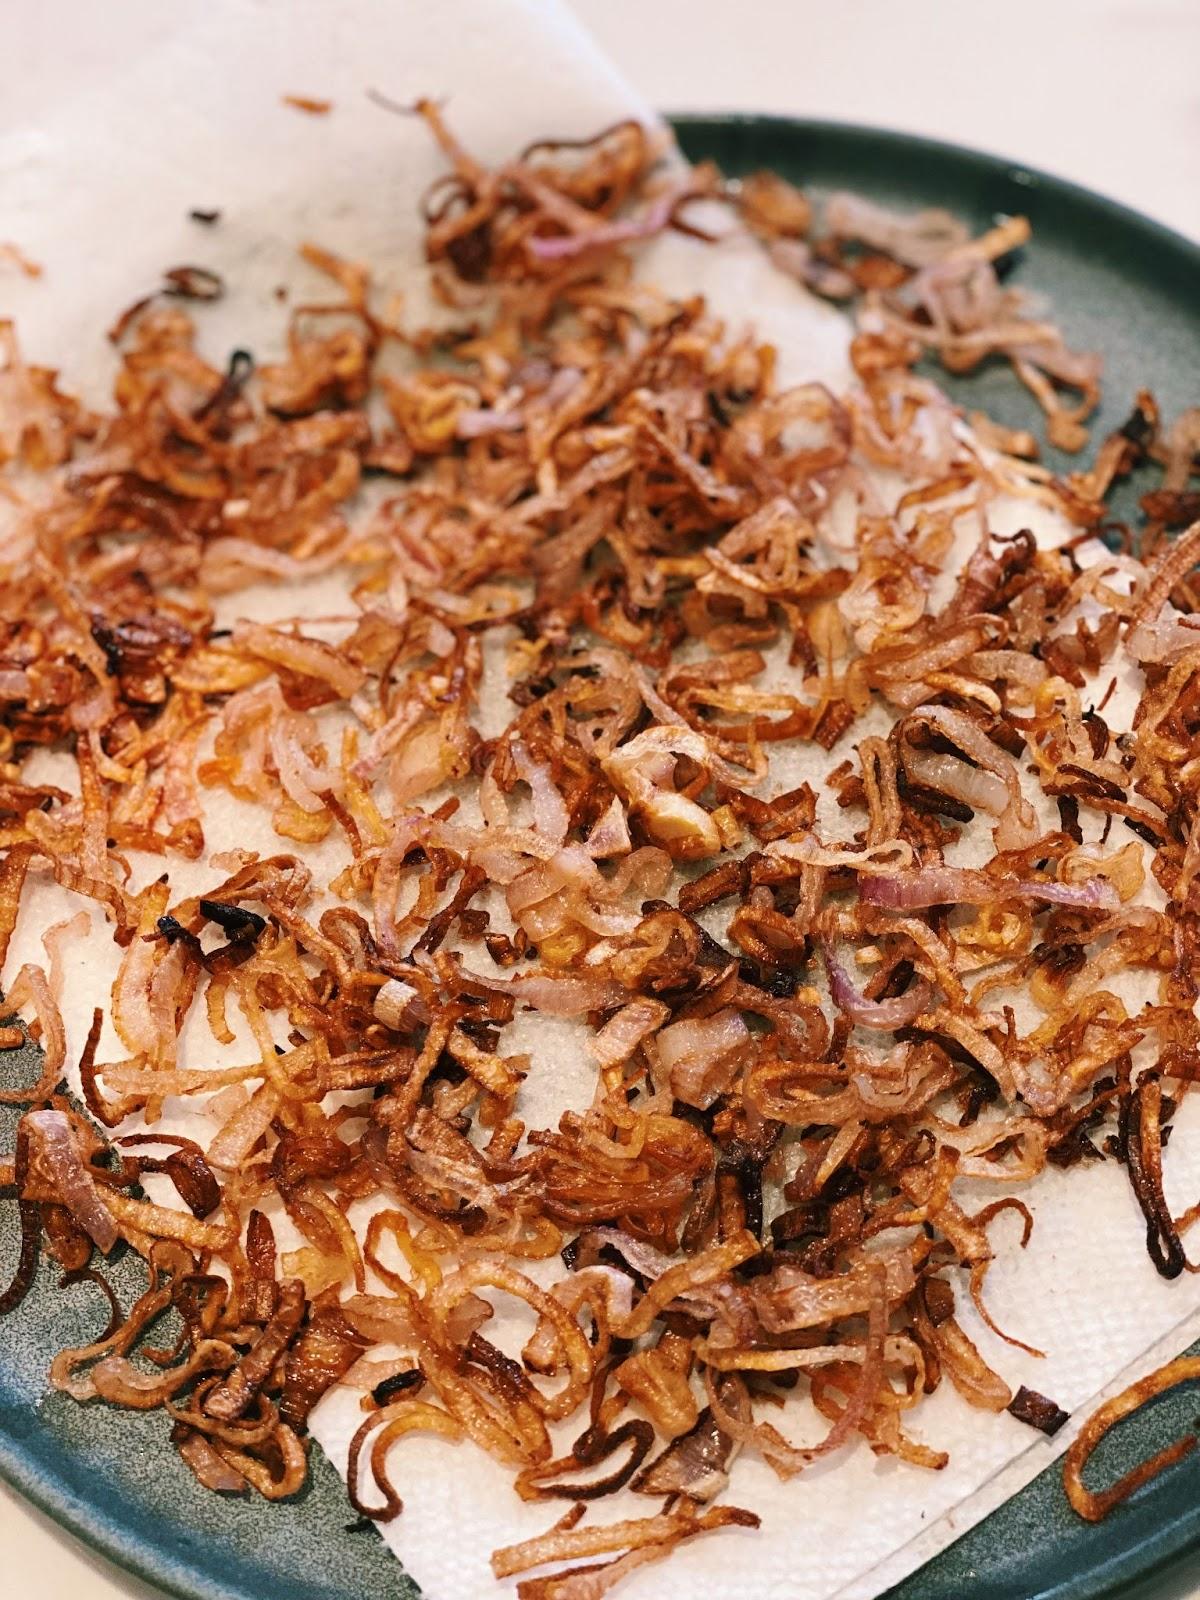 fried shallots